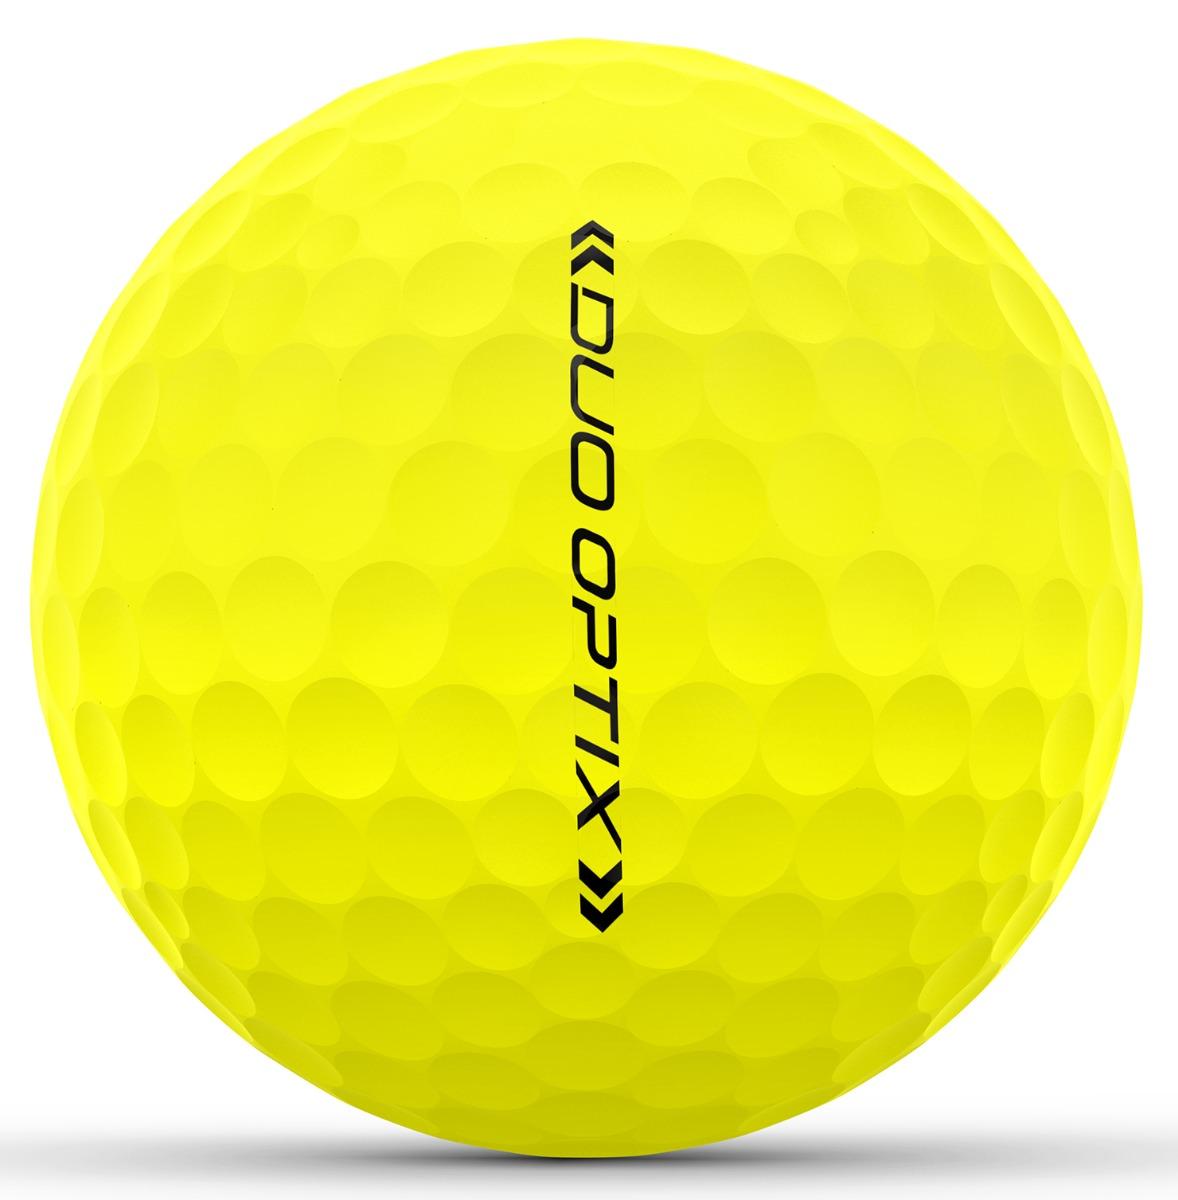 https://www.best4sportsballs.com/pub/media/catalog/product/d/u/duo_optix_yellow_ball_600.jpg